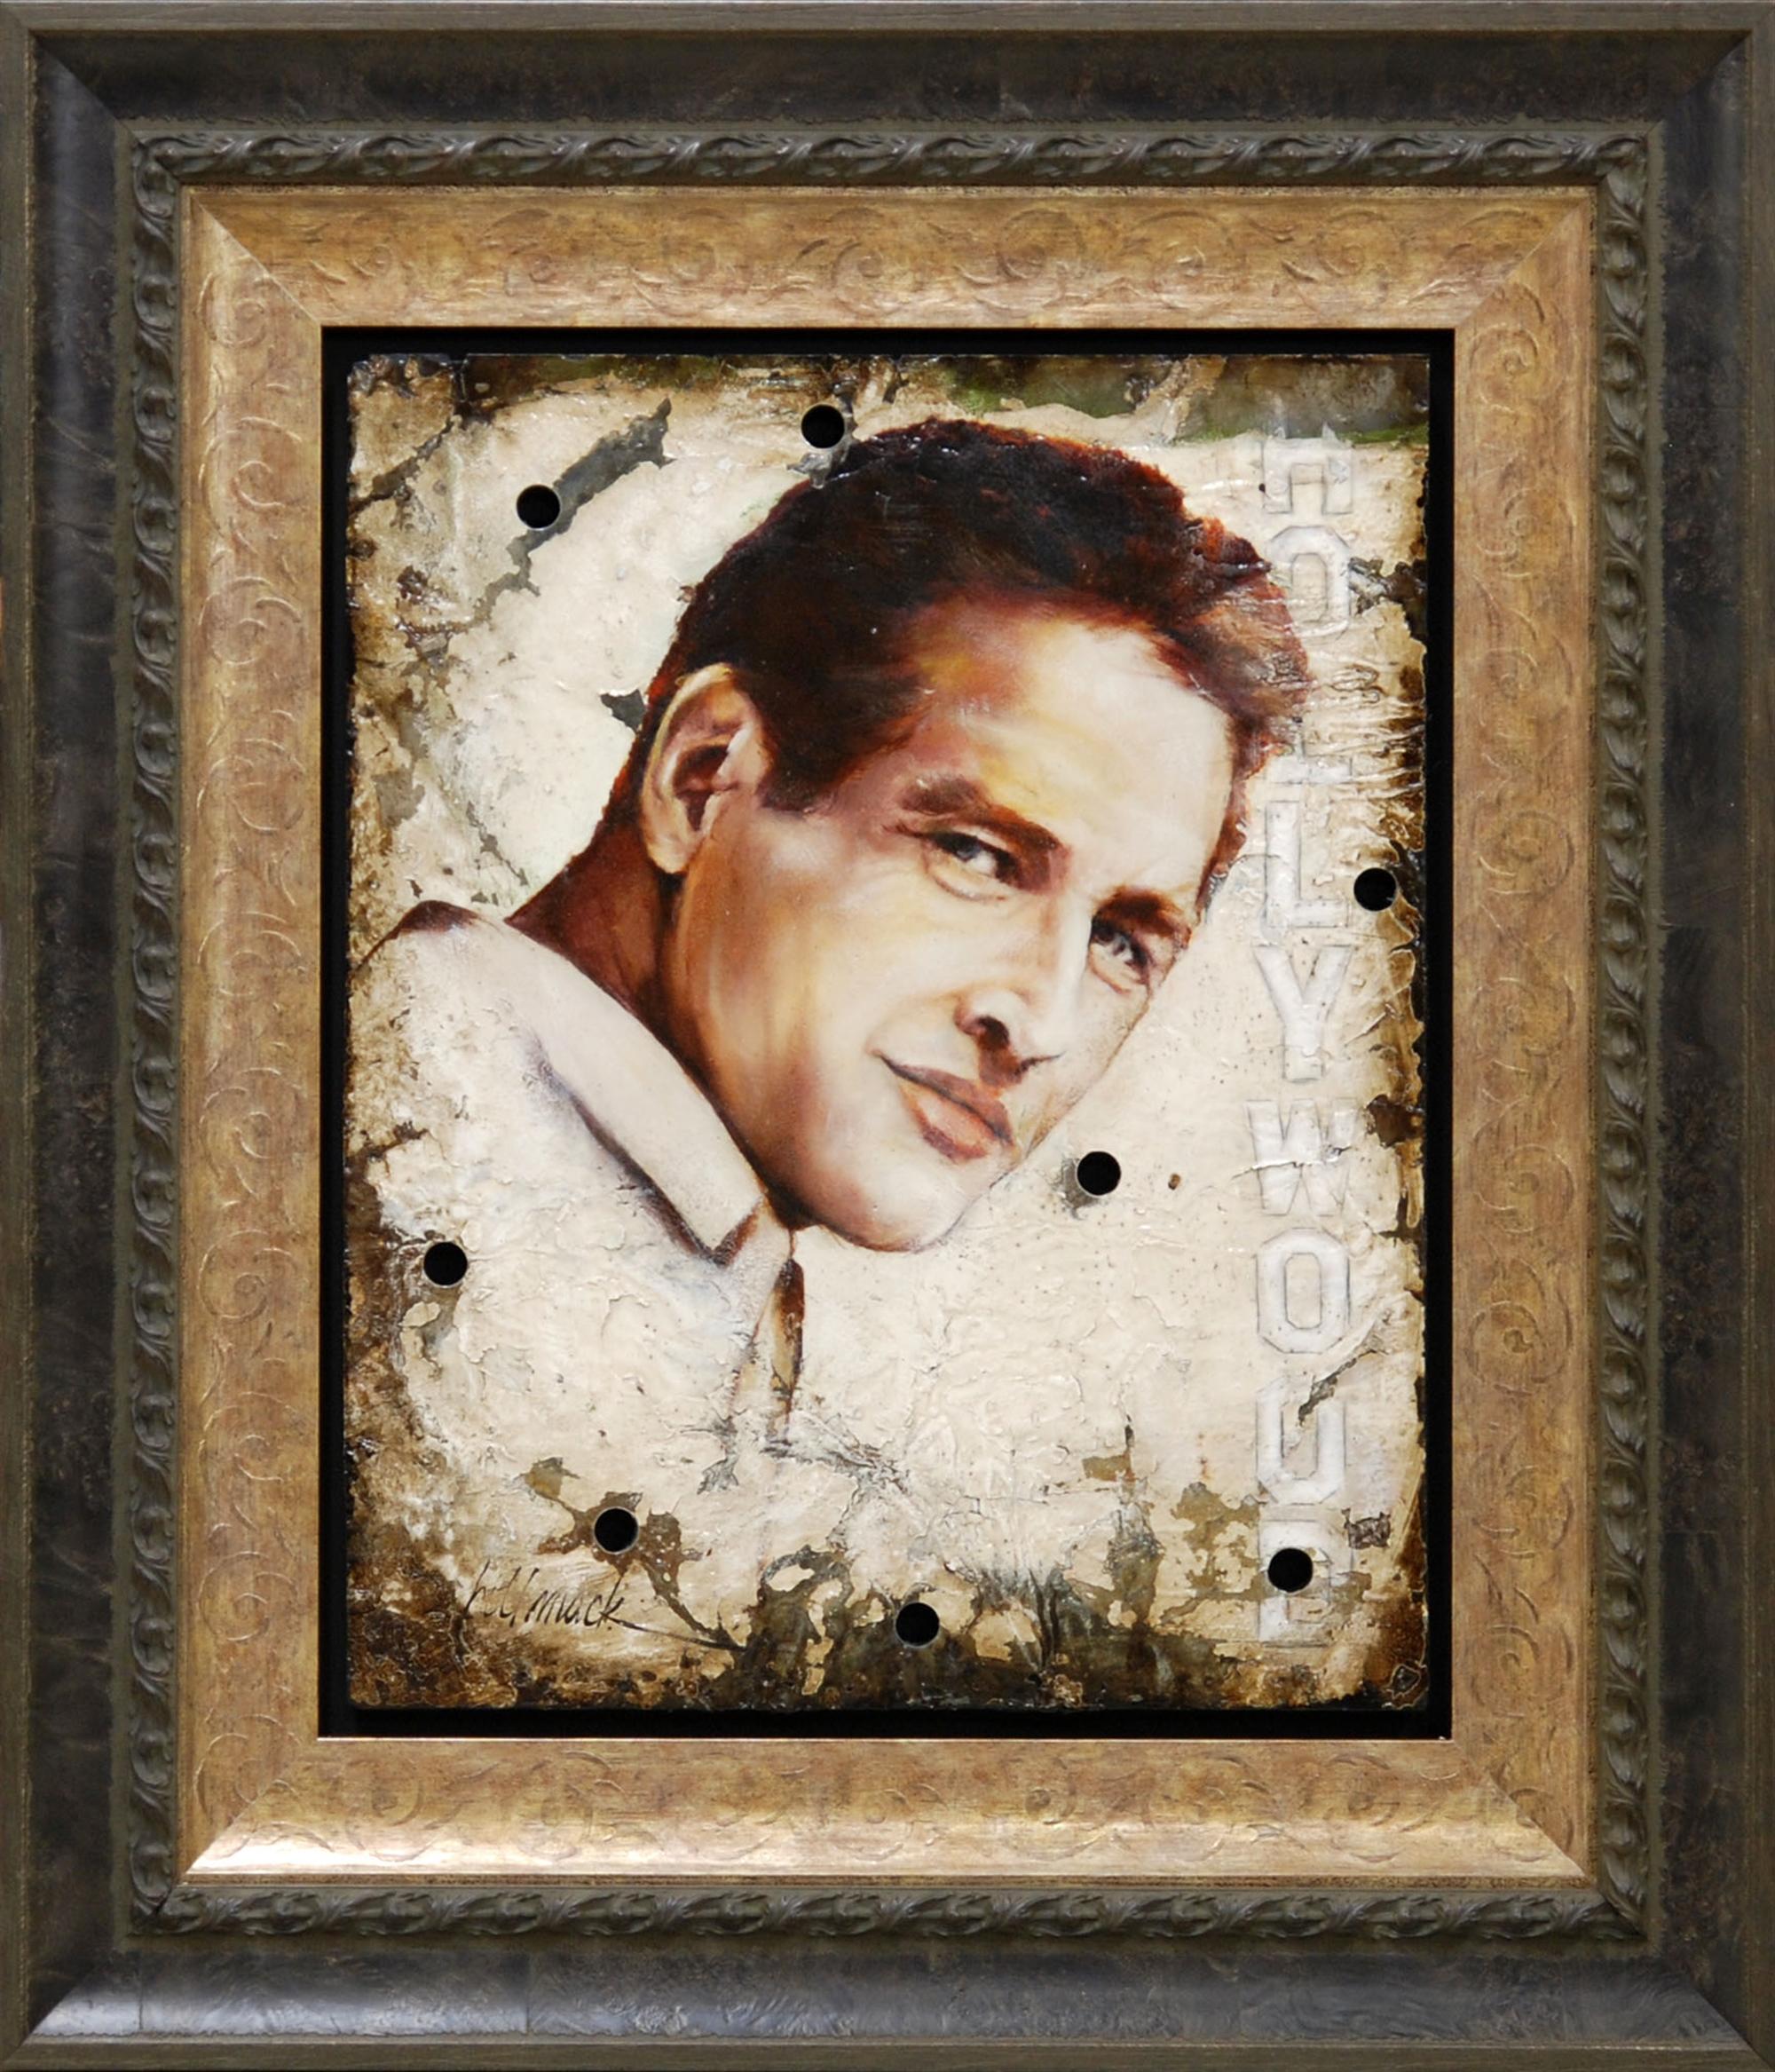 Paul Newman by Bill Mack